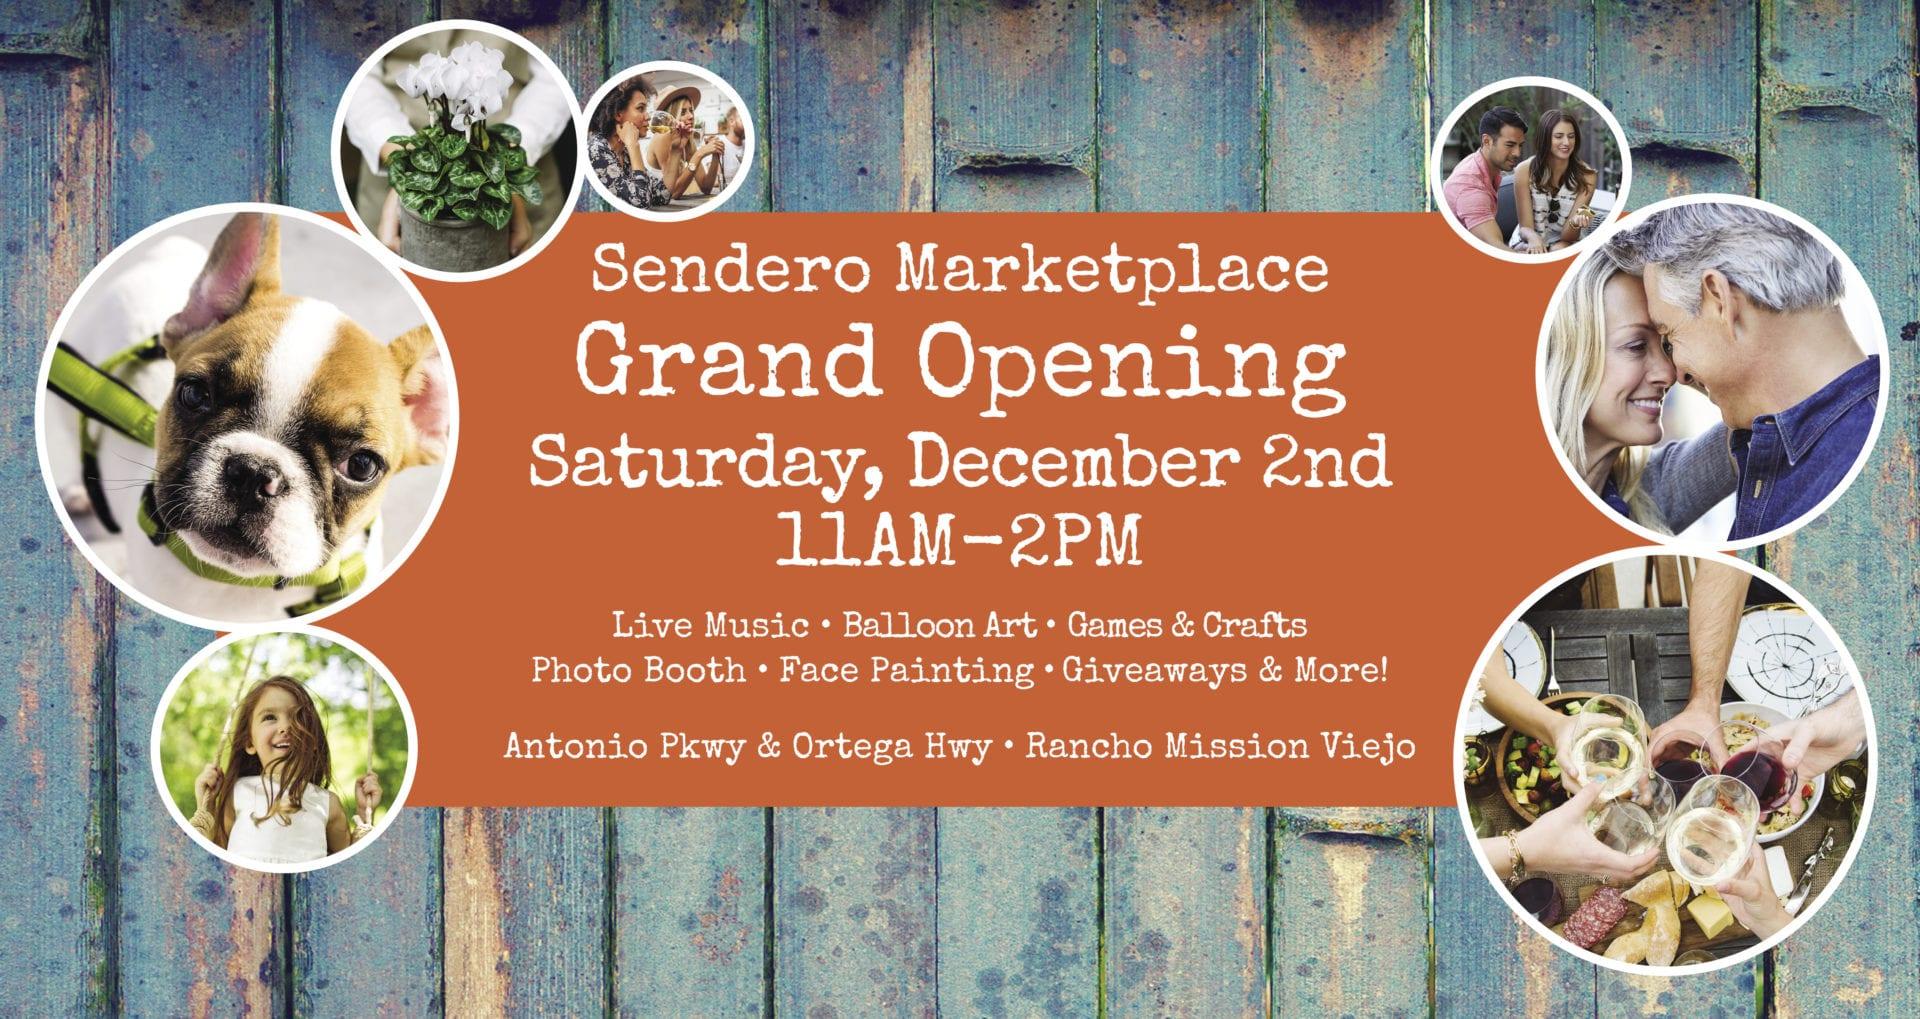 Sendero Marketplace Grand Opening